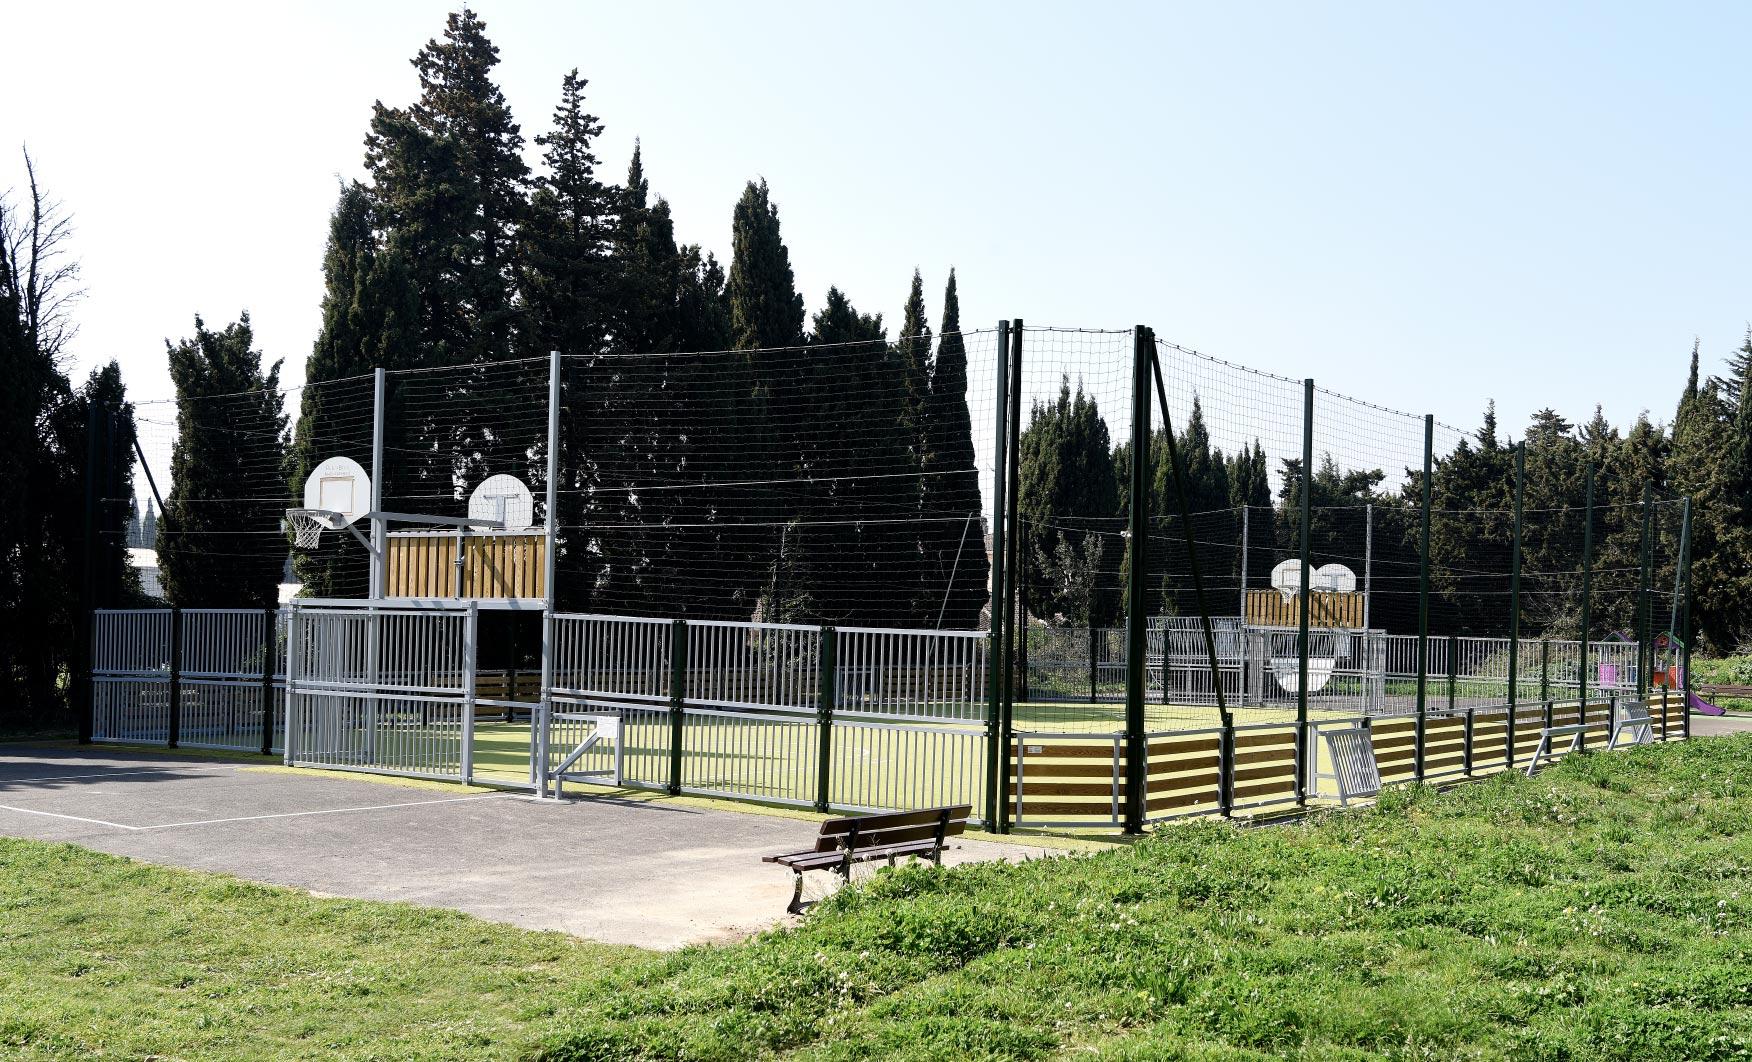 Intégration d'un terrain multisports complet (filet pare-ballons, gazon synthétique, pratique du football, basket, handball, volley)